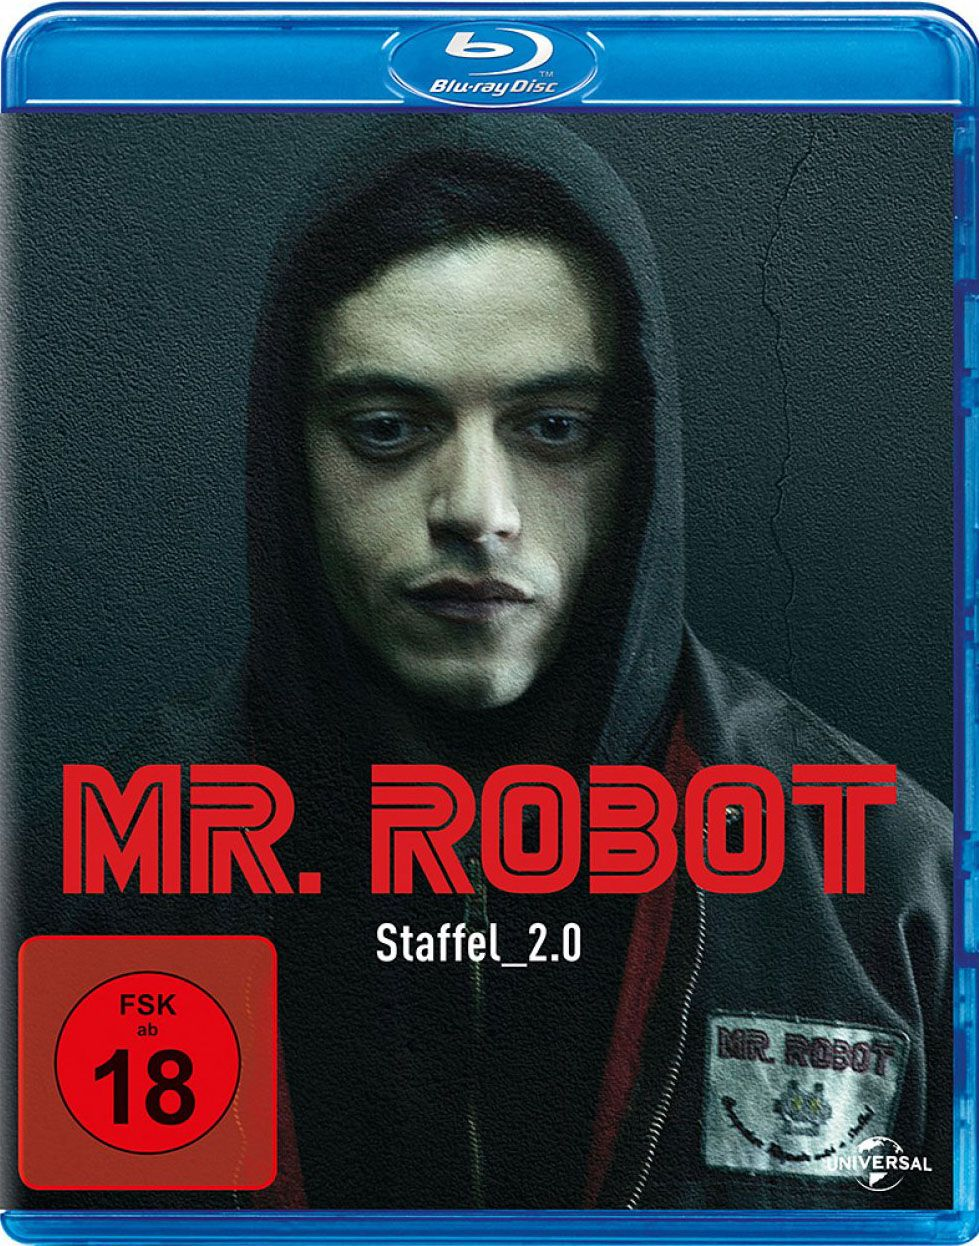 Mr. Robot - Staffel 2 (3 Discs) (BLURAY)